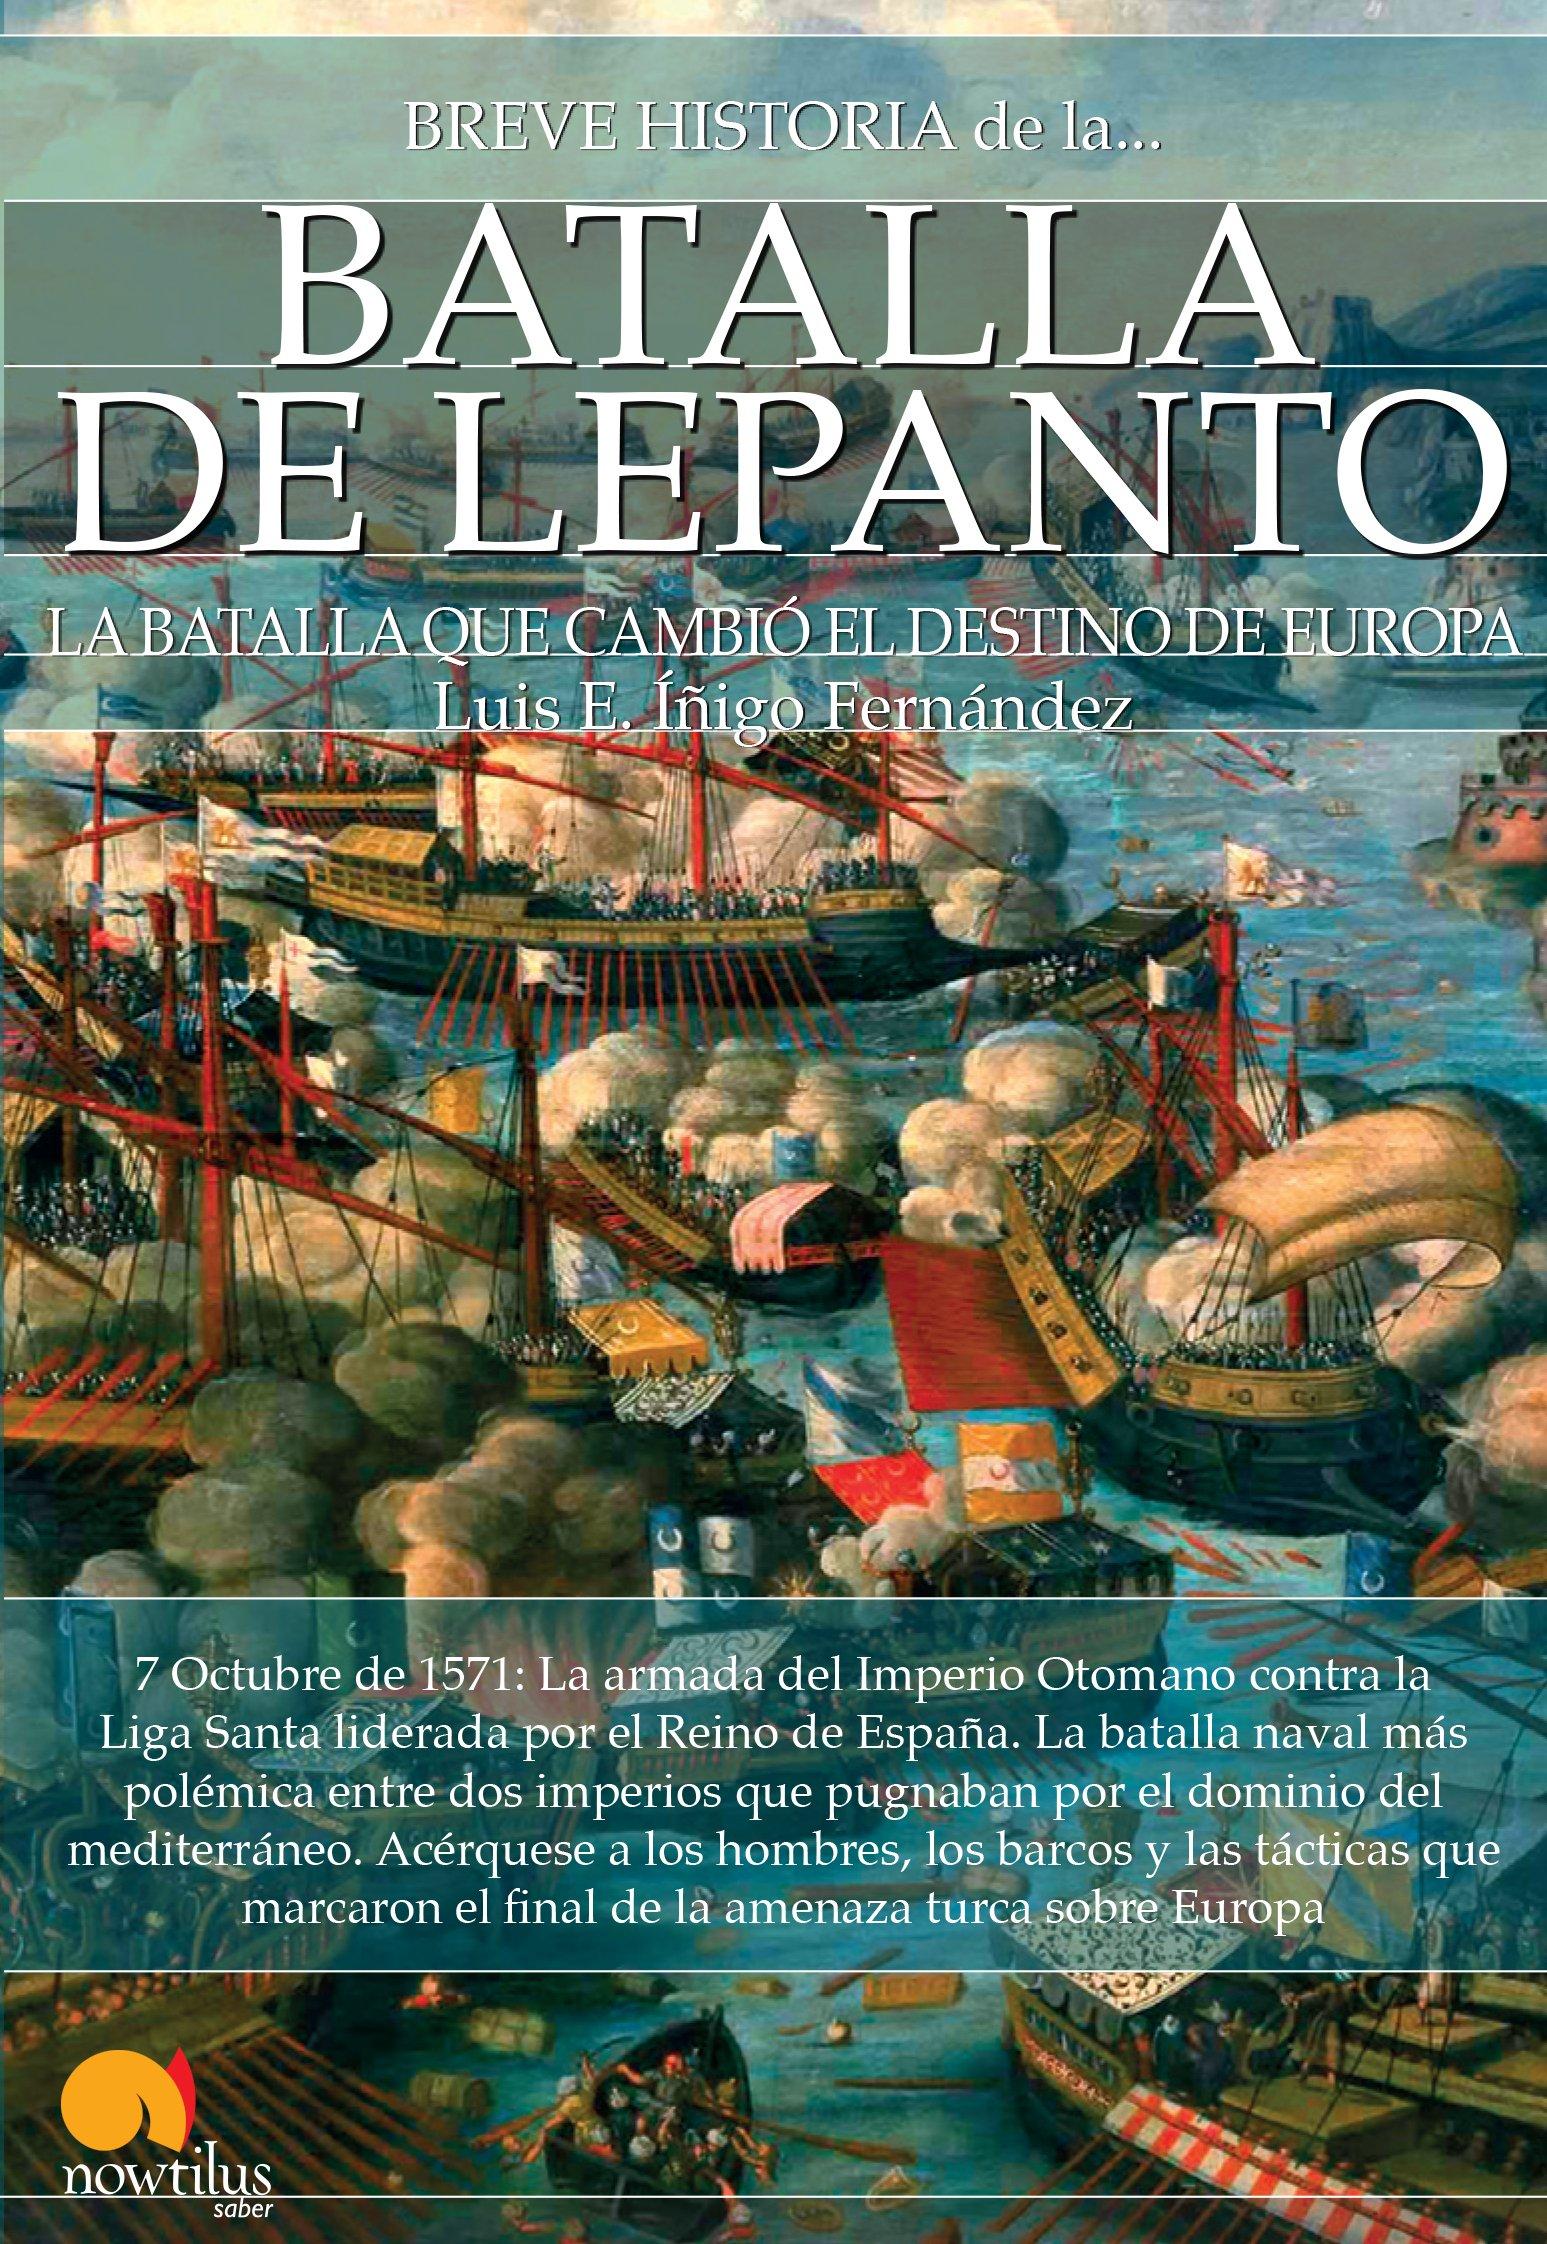 Breve historia de la Batalla de Lepanto: Amazon.es: Luis E. Íñigo Fernández: Libros